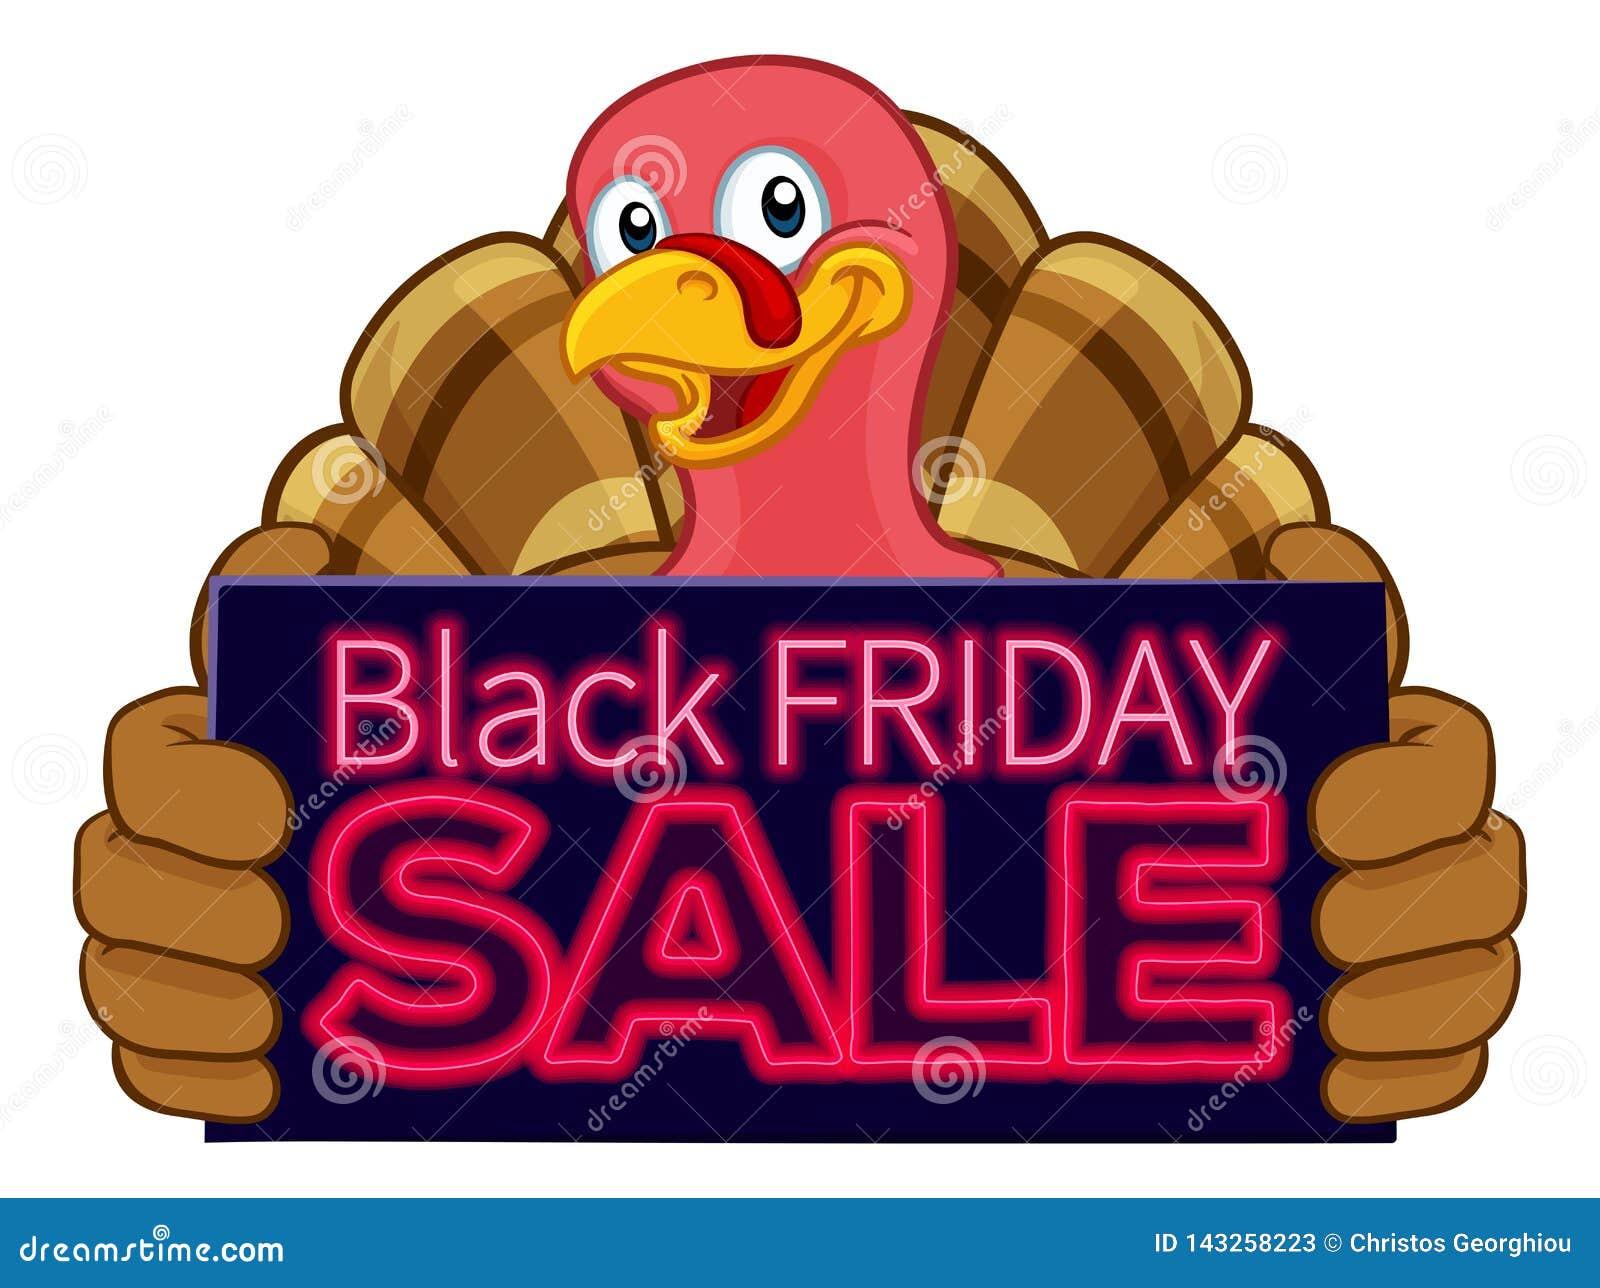 Bande Dessinee De Vente De La Turquie Black Friday Illustration De Vecteur Illustration Du Black Turquie 143258223